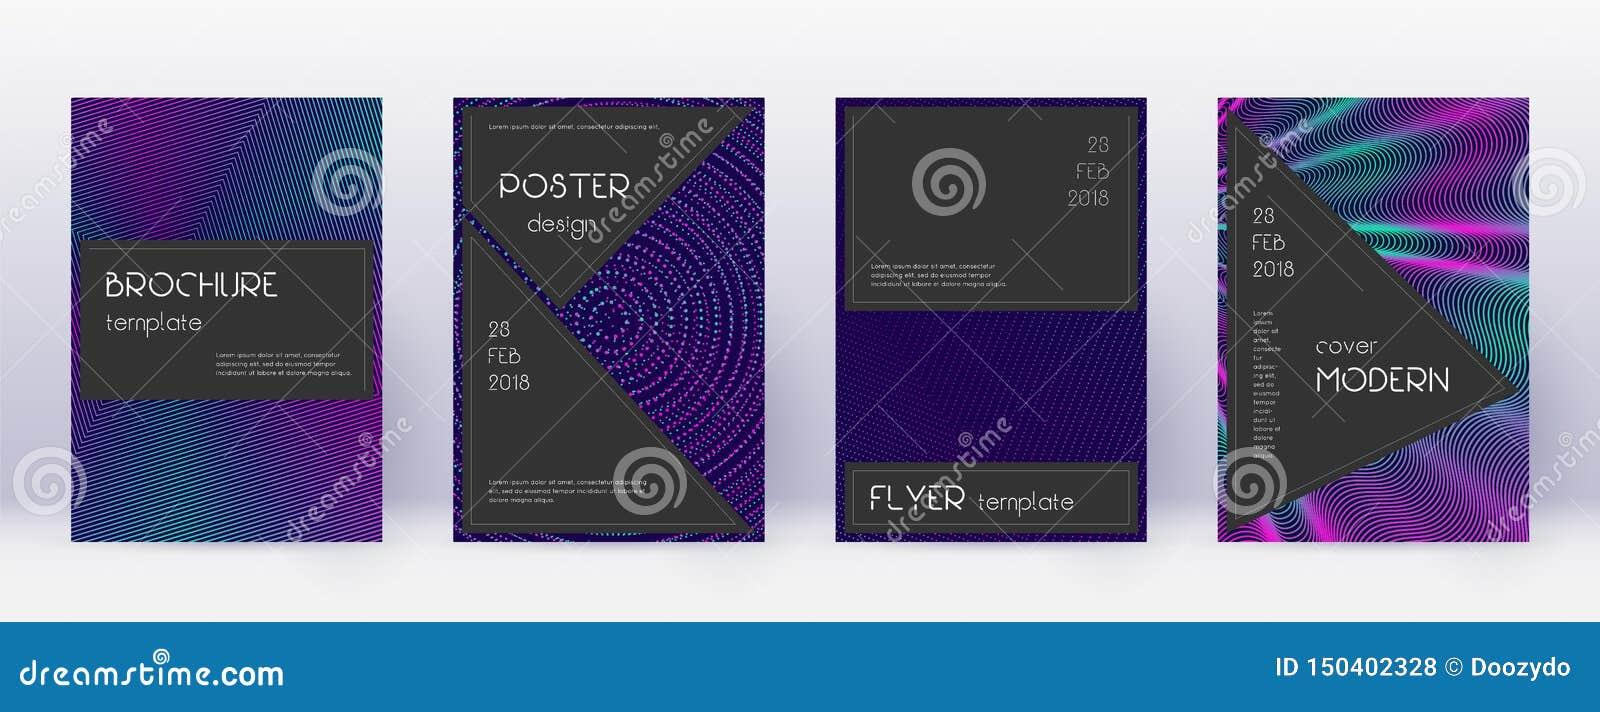 Black brochure design template set. Neon abstract